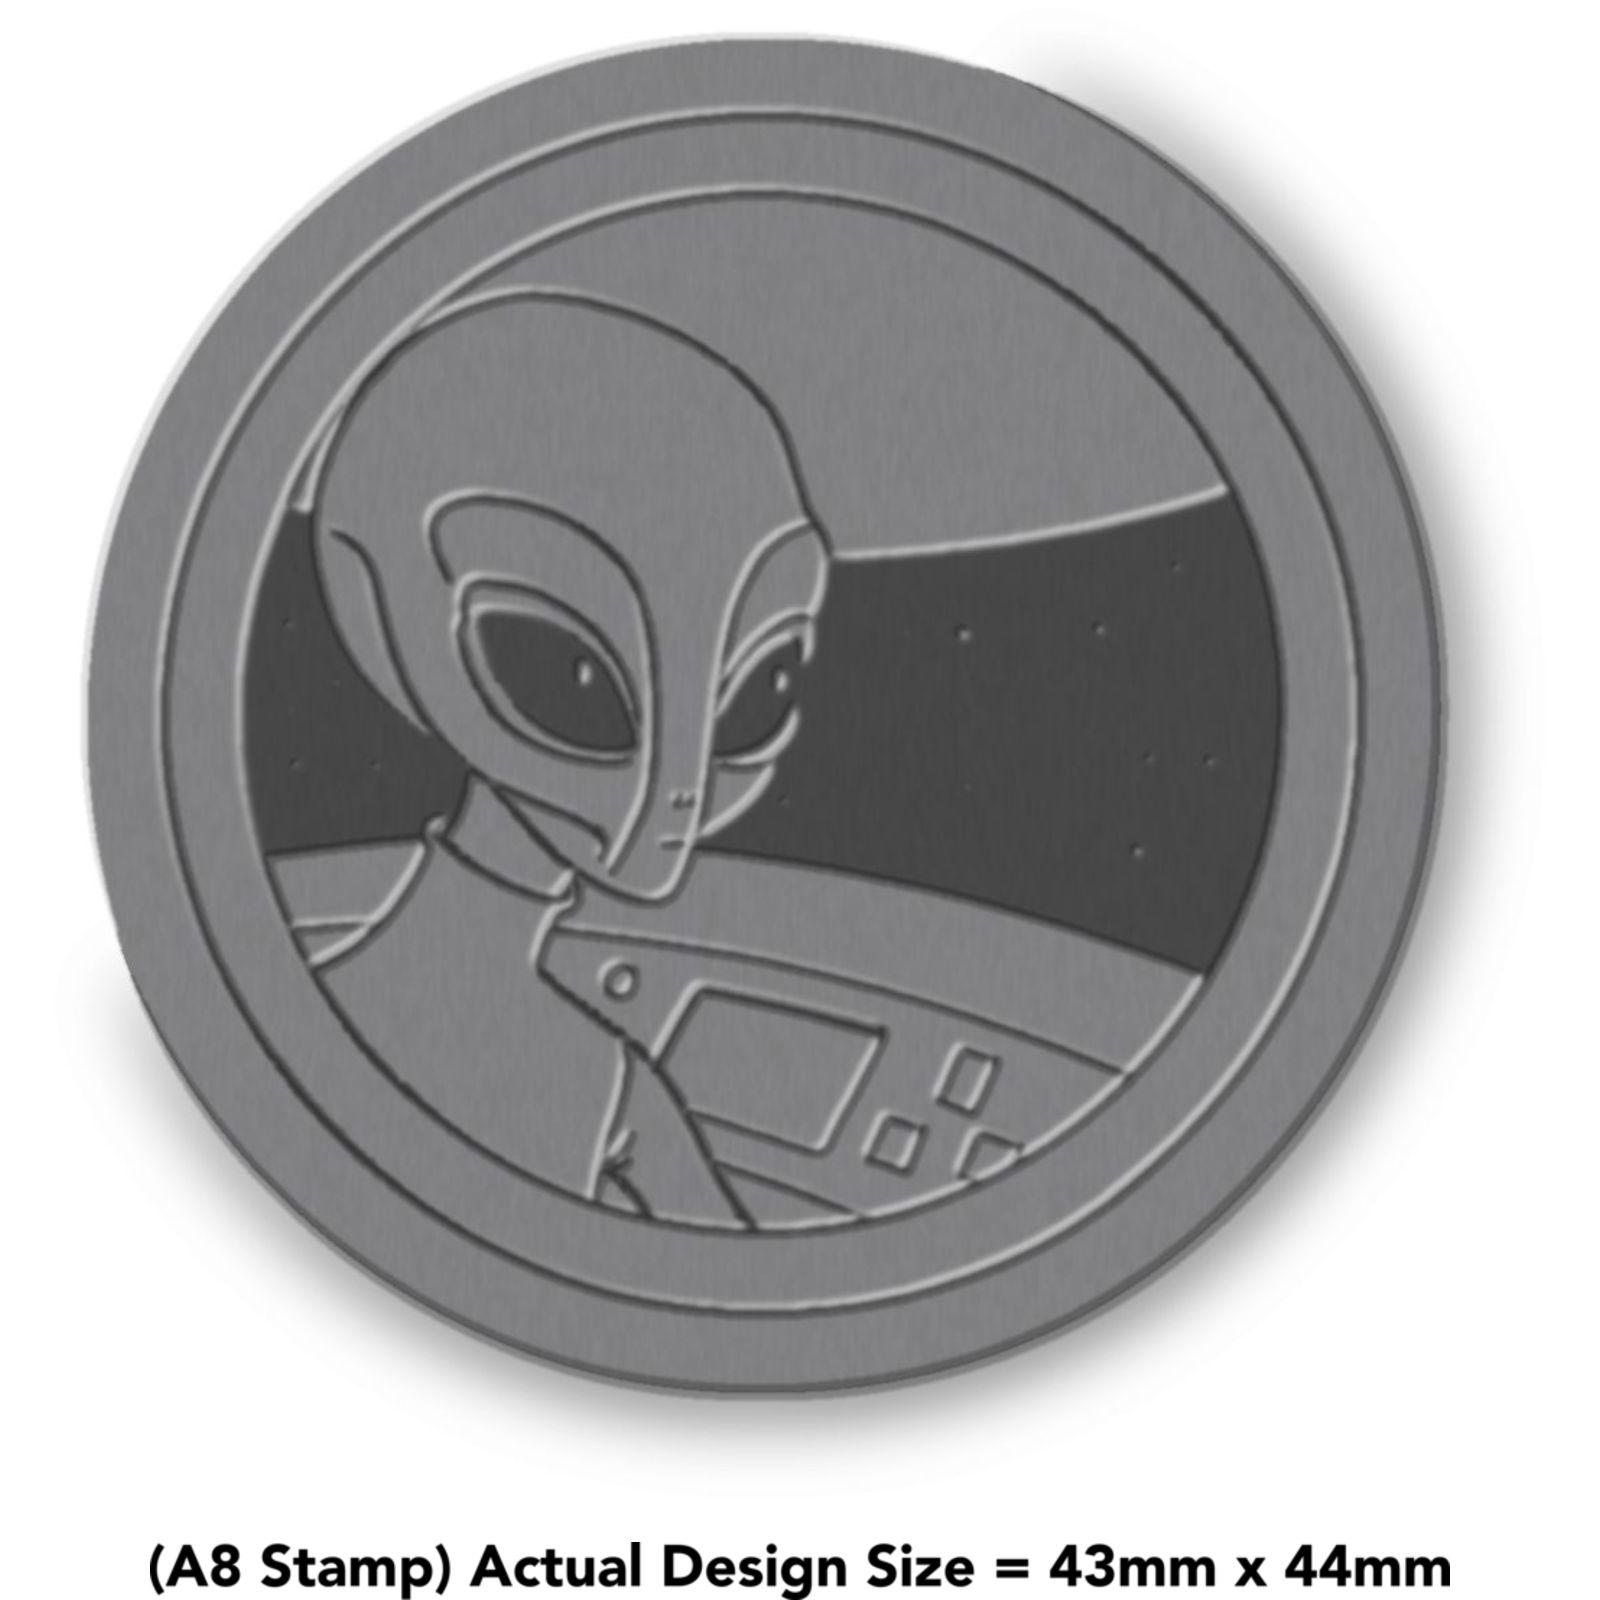 039-Extraterrestre-039-RS007860 miniatura 6